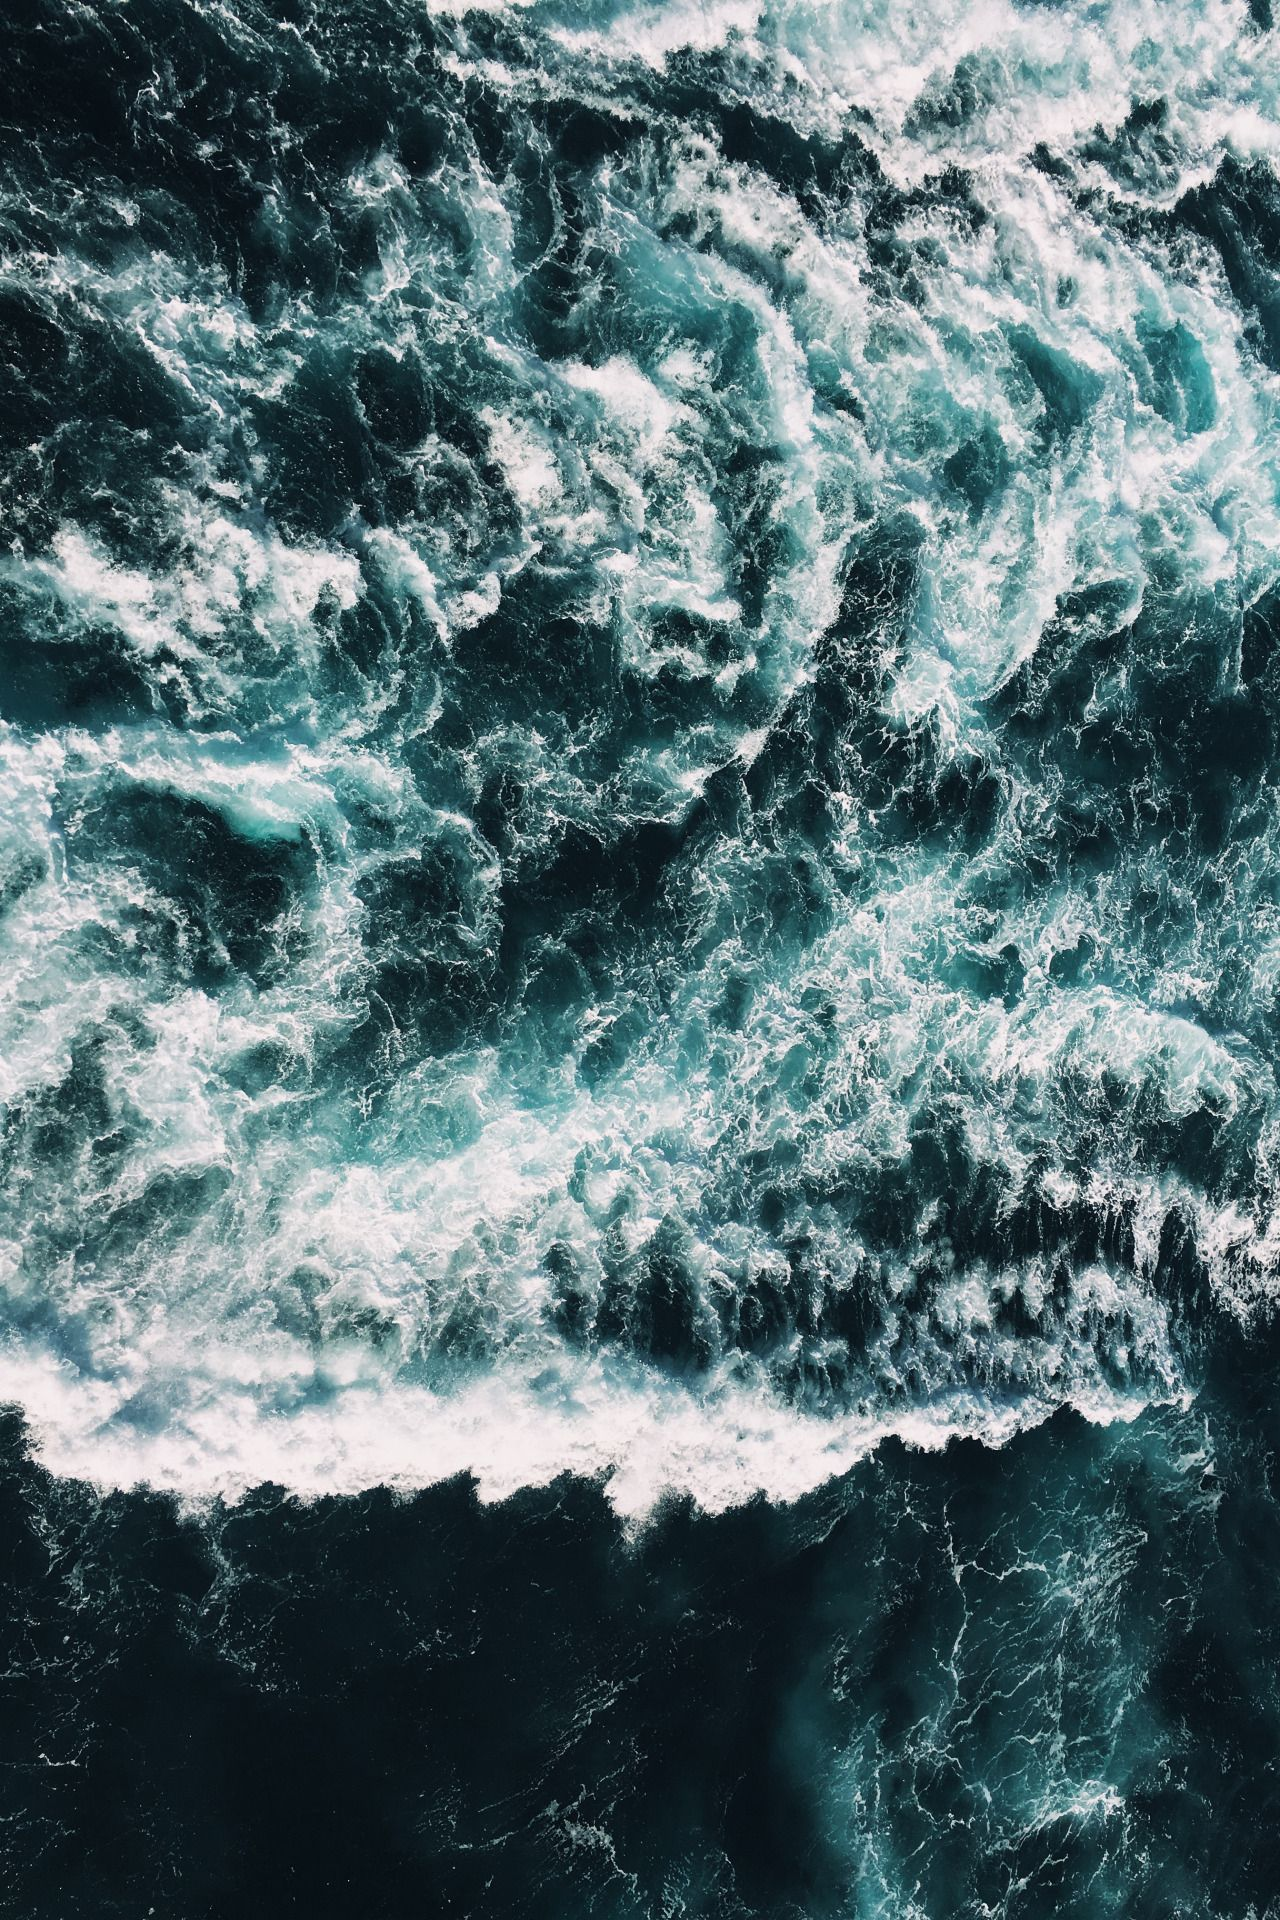 Ozean stil zimmer new post on travelstory  dreamlands in   pinterest